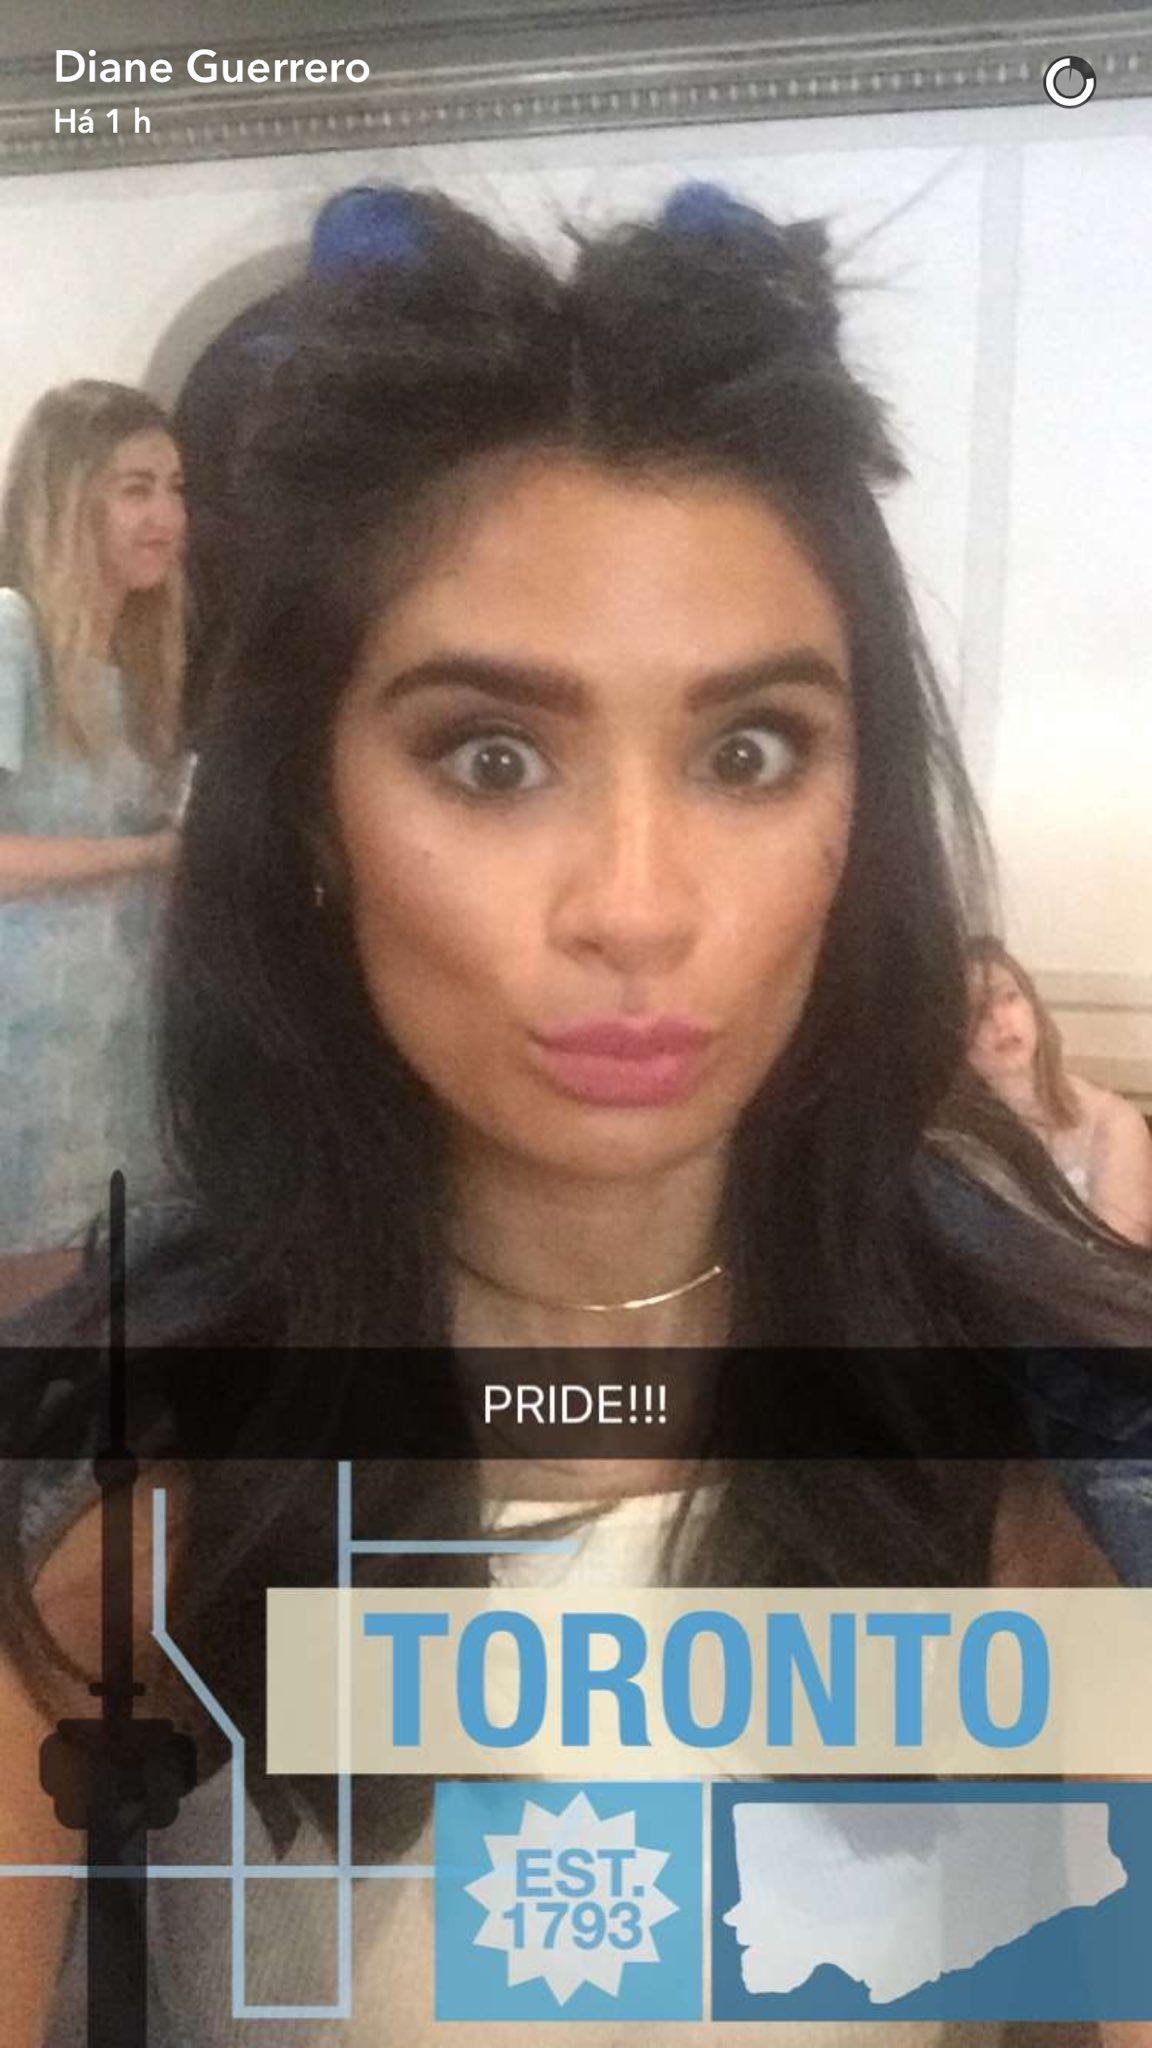 Snapchat Diane Guerrero nude photos 2019